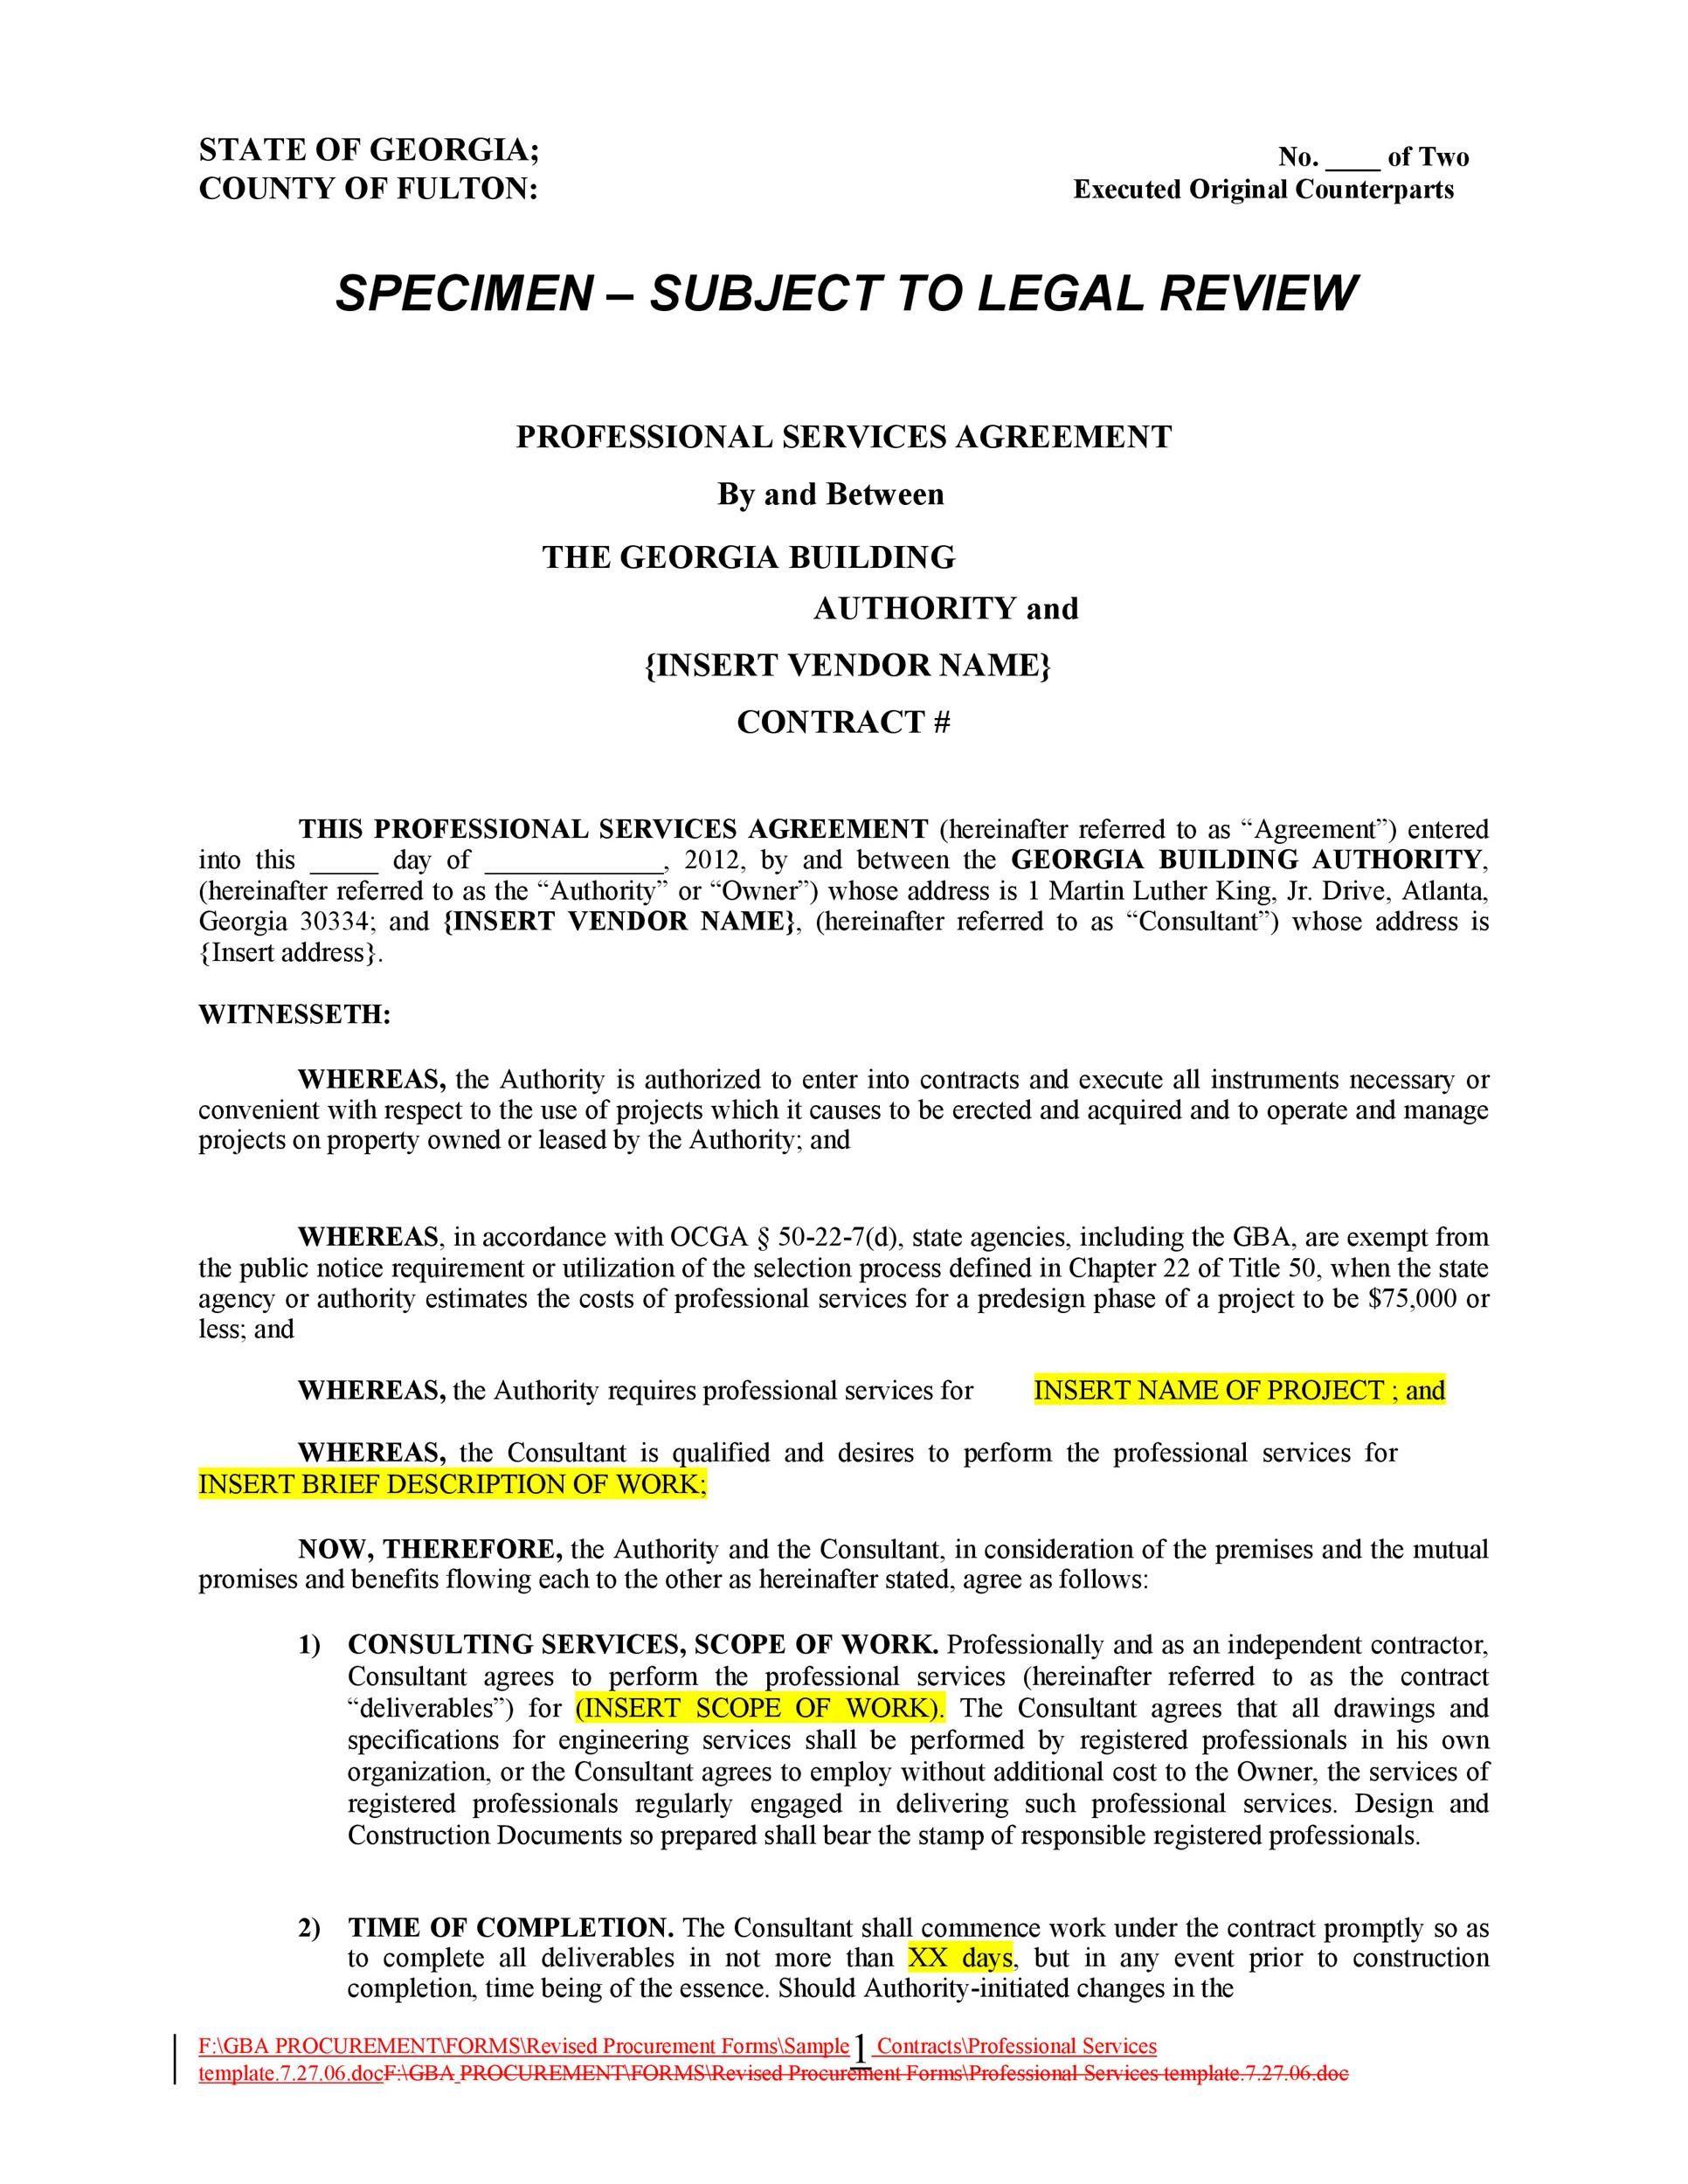 007 Stunning Master Service Agreement Template Highest Quality  Free AustraliaFull